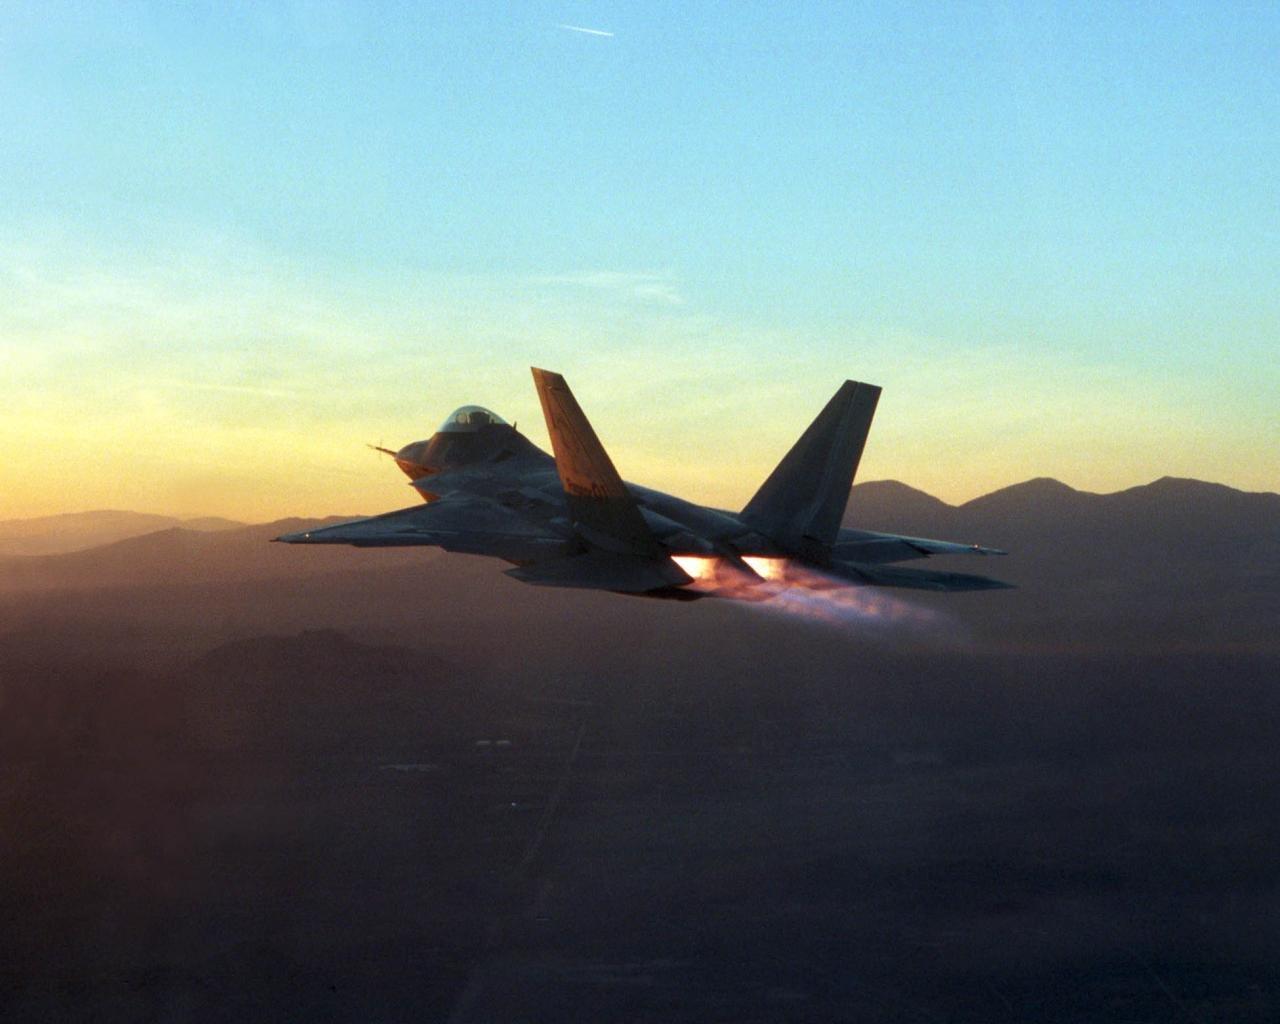 Free Lockheed Martin F 22 Raptor High Quality Wallpaper Id 446231